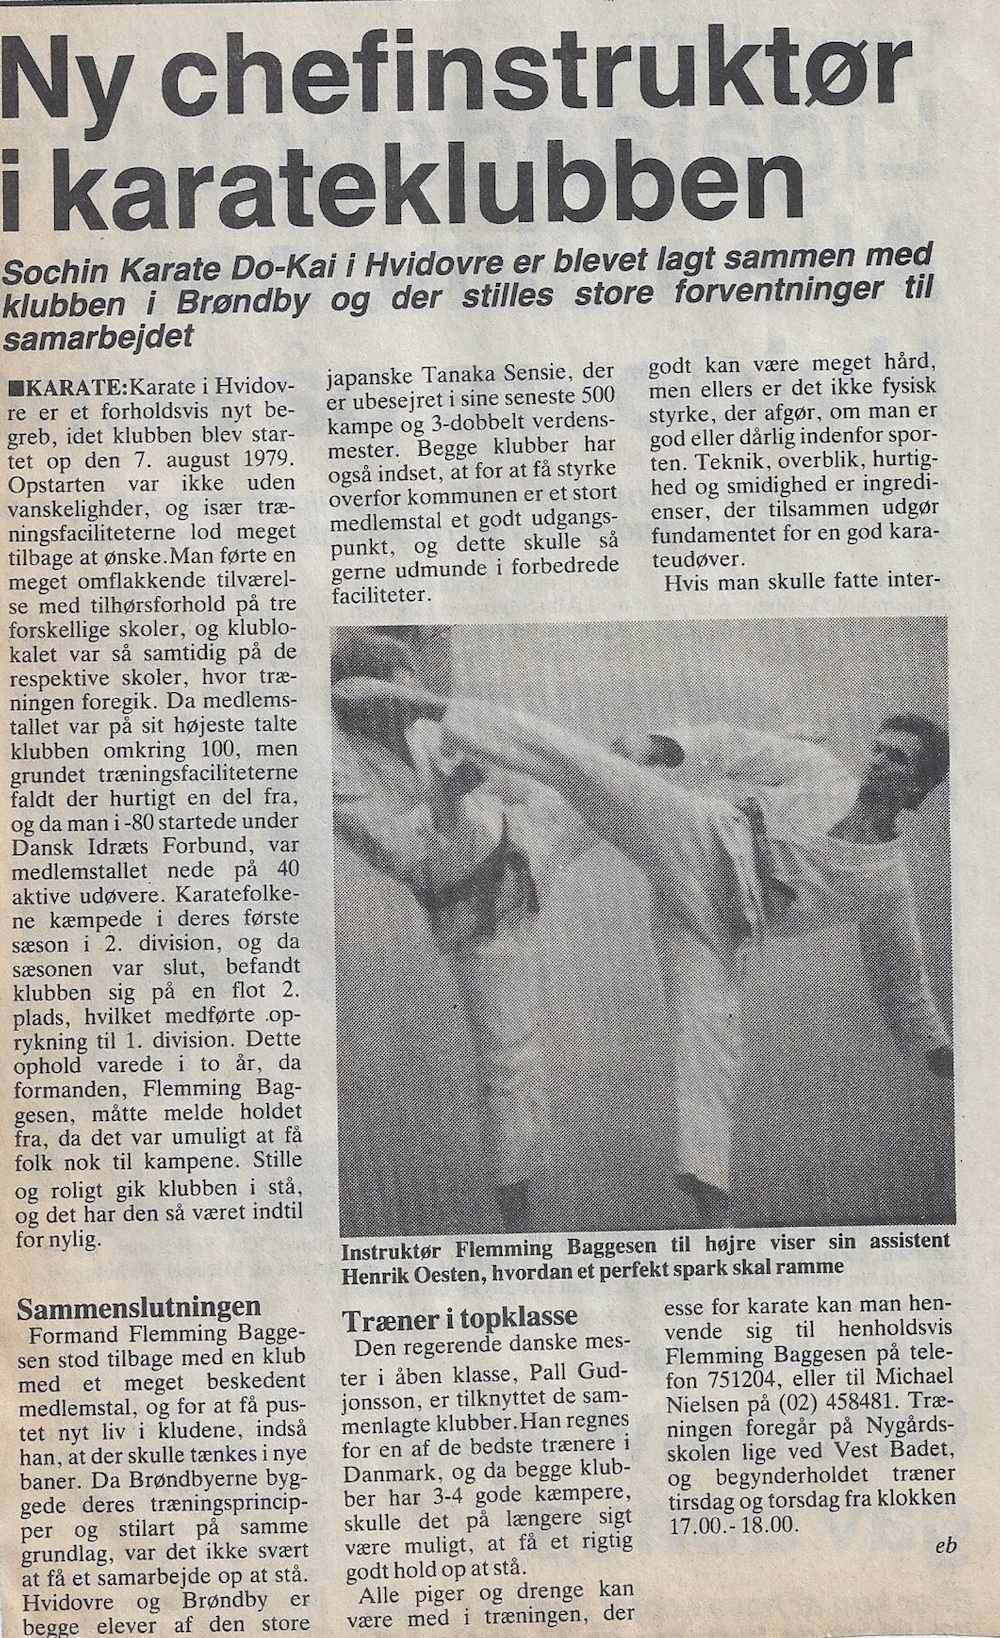 I 1986 fik Sochin Karate ny chefinstruktør - Flemming Baggesen overtog formelt klubben.